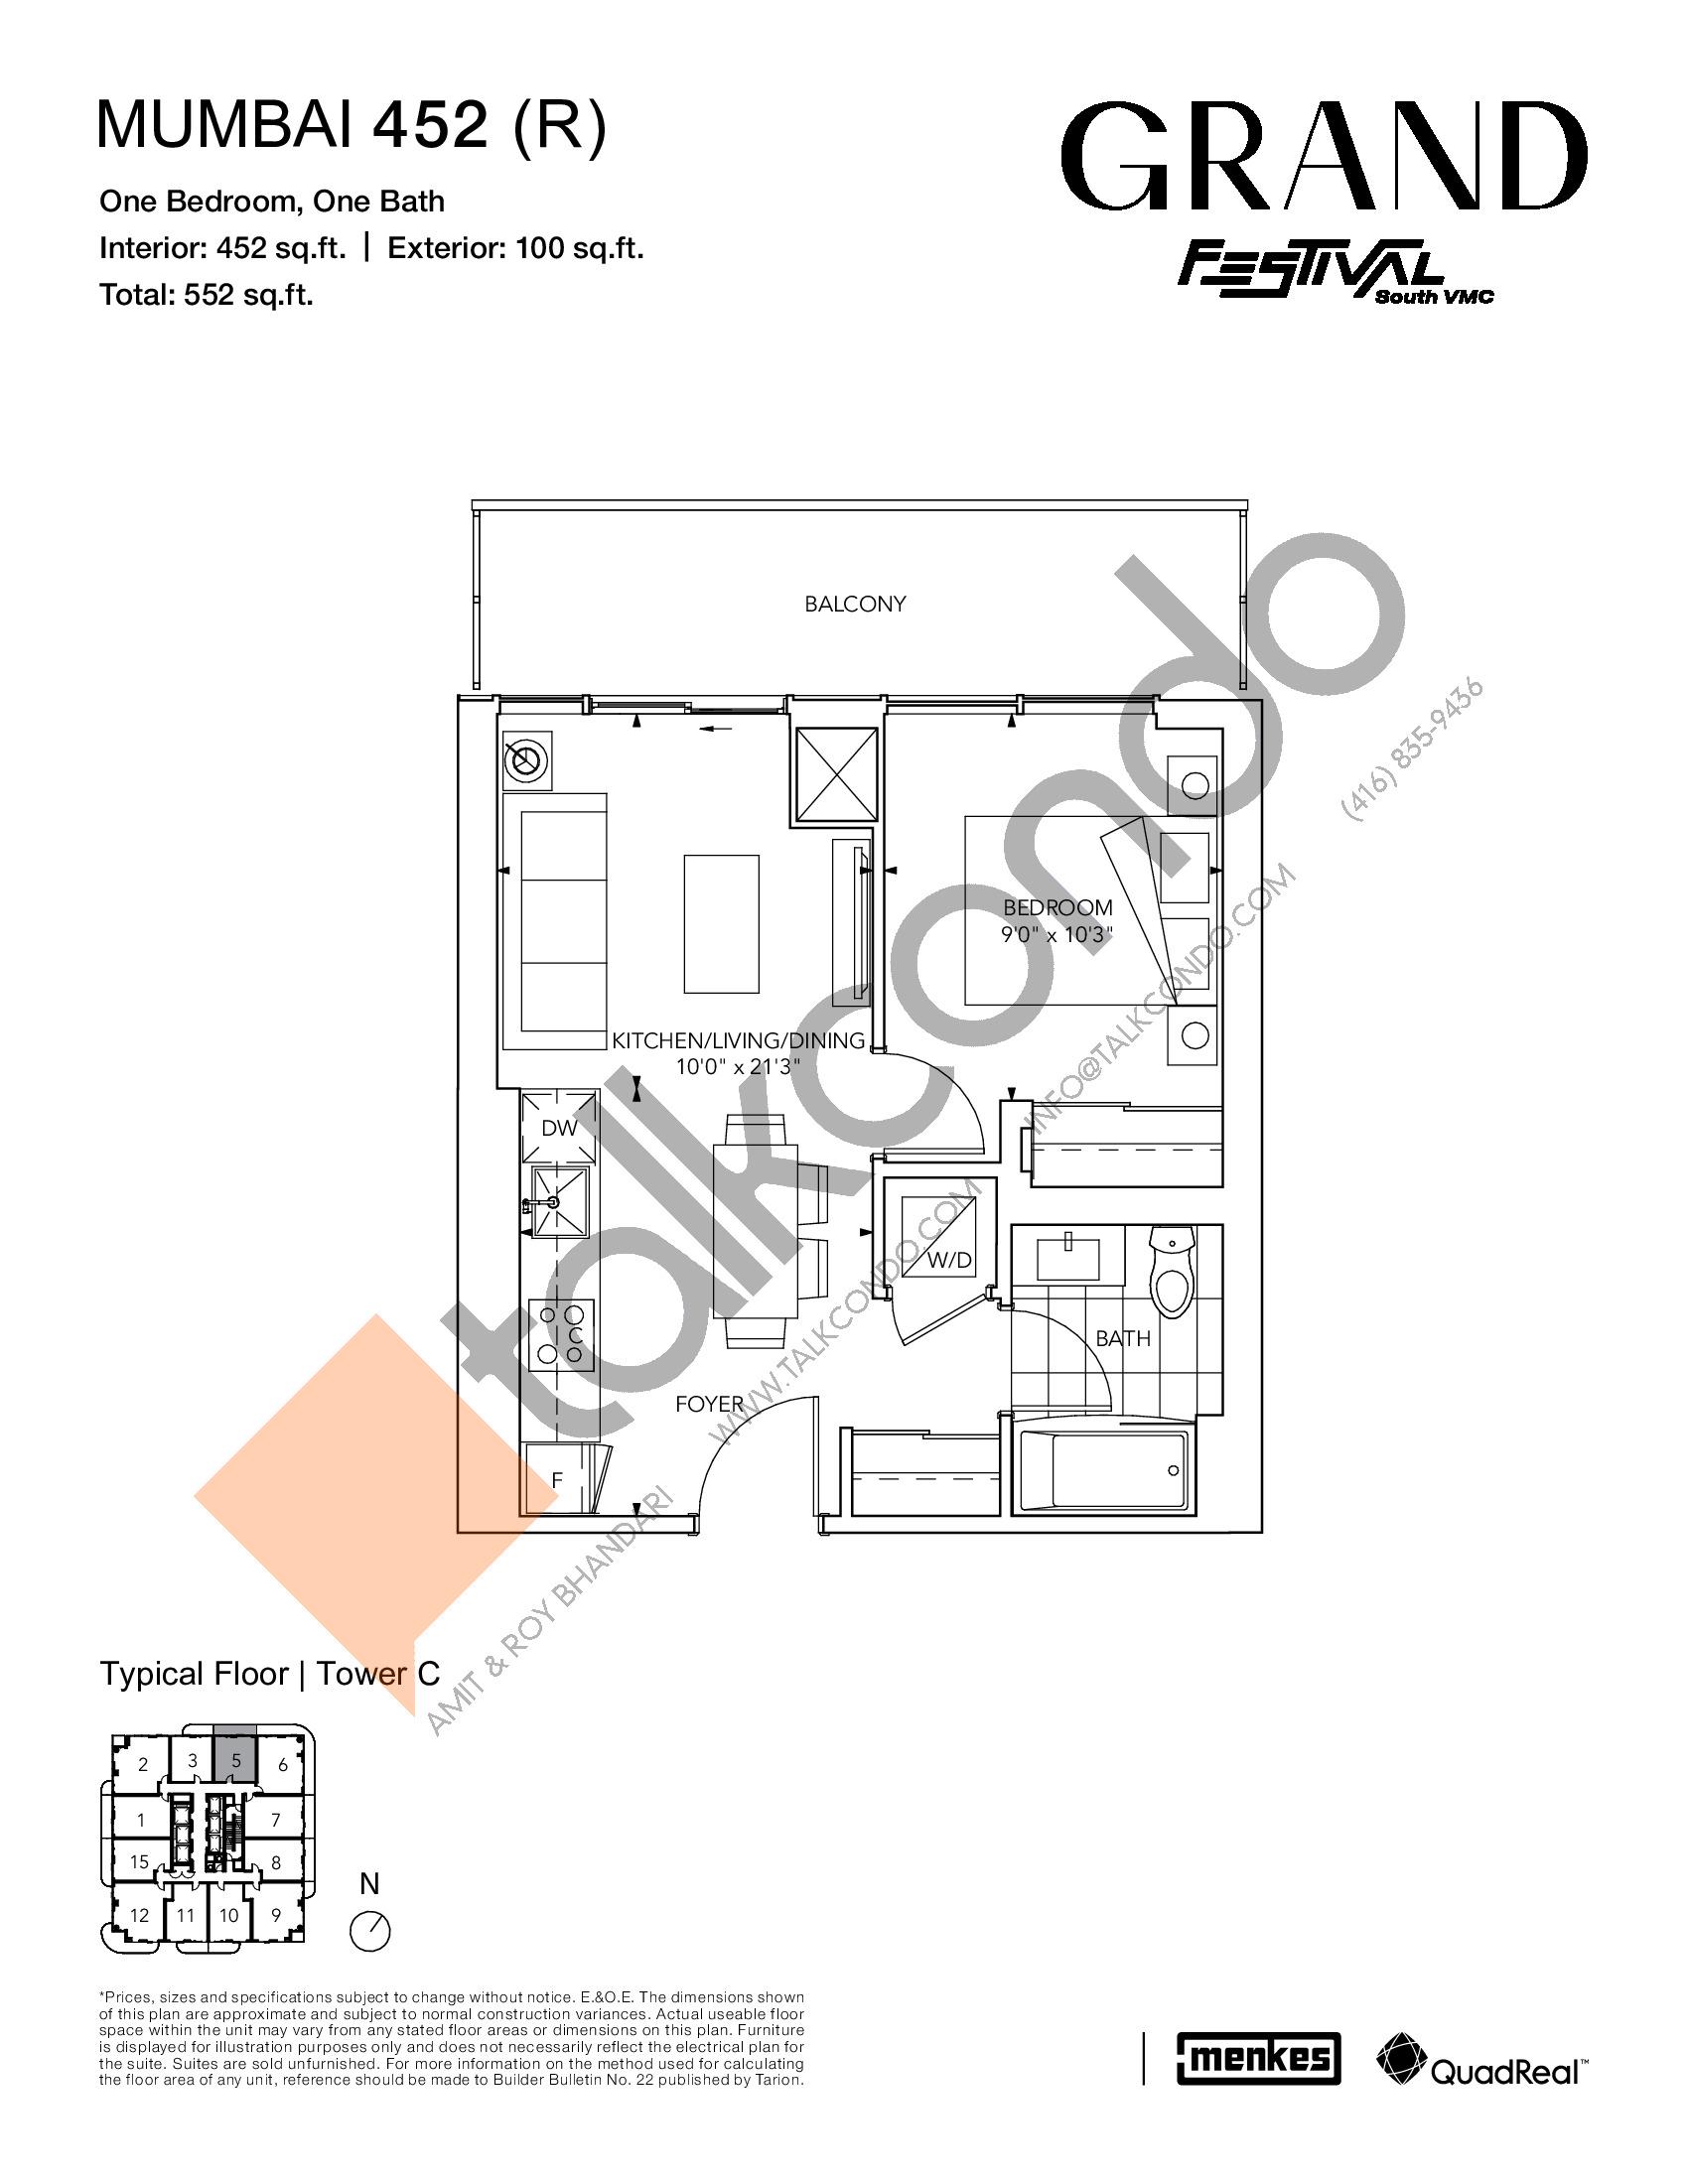 Mumbai 452 (R) Floor Plan at Grand Festival Condos - 452 sq.ft